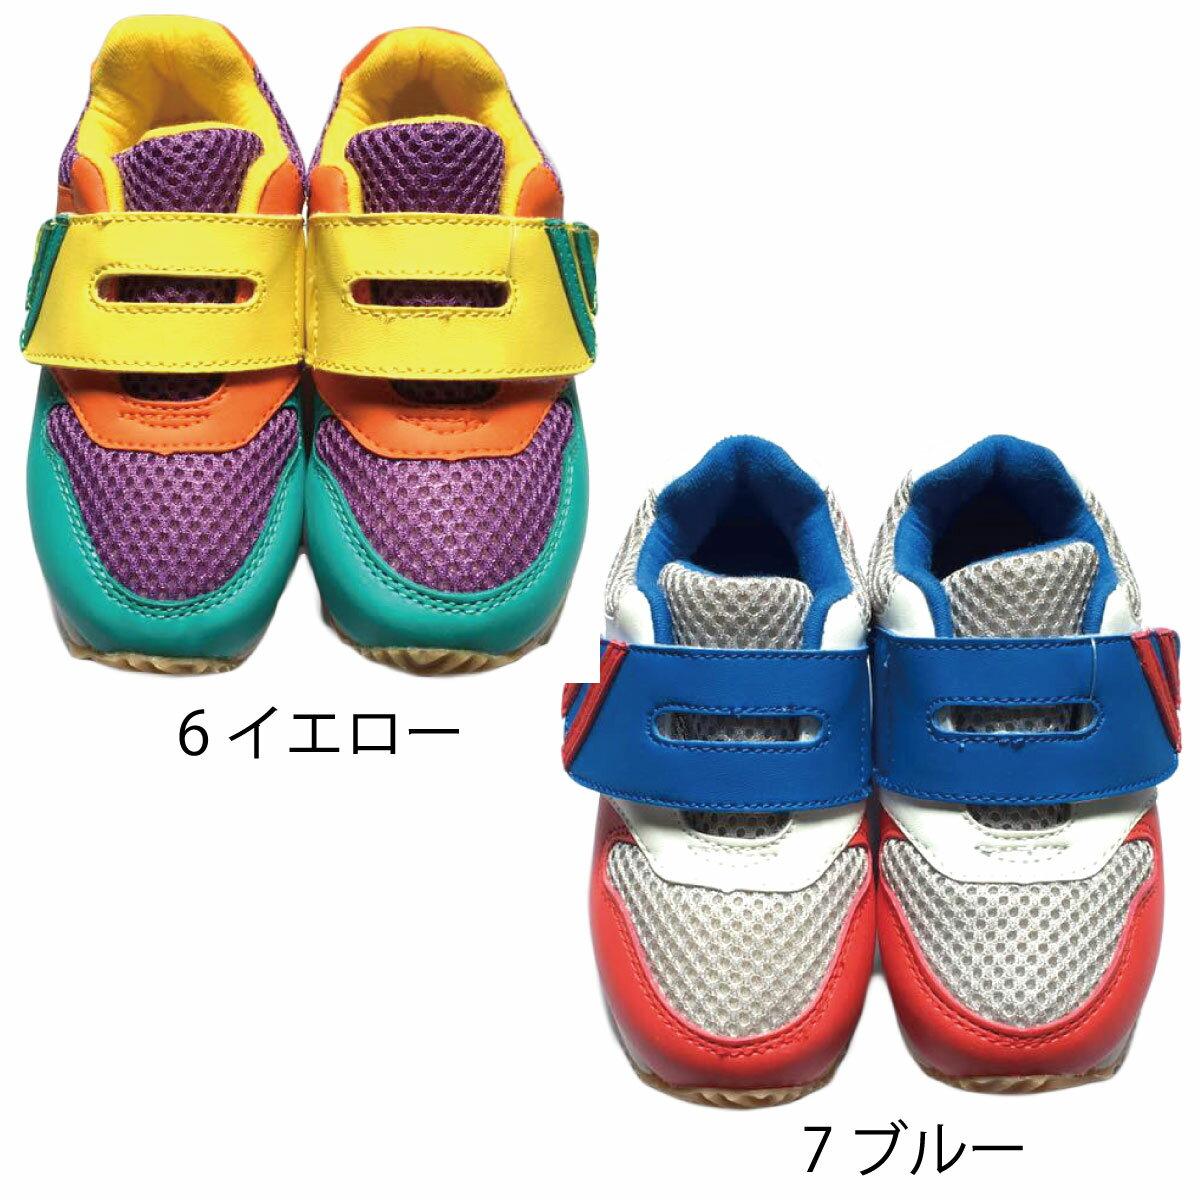 【SiShuNon/SKAPE】カラフルスニーカー エスケープ キッズ 靴 カラフル スニーカー